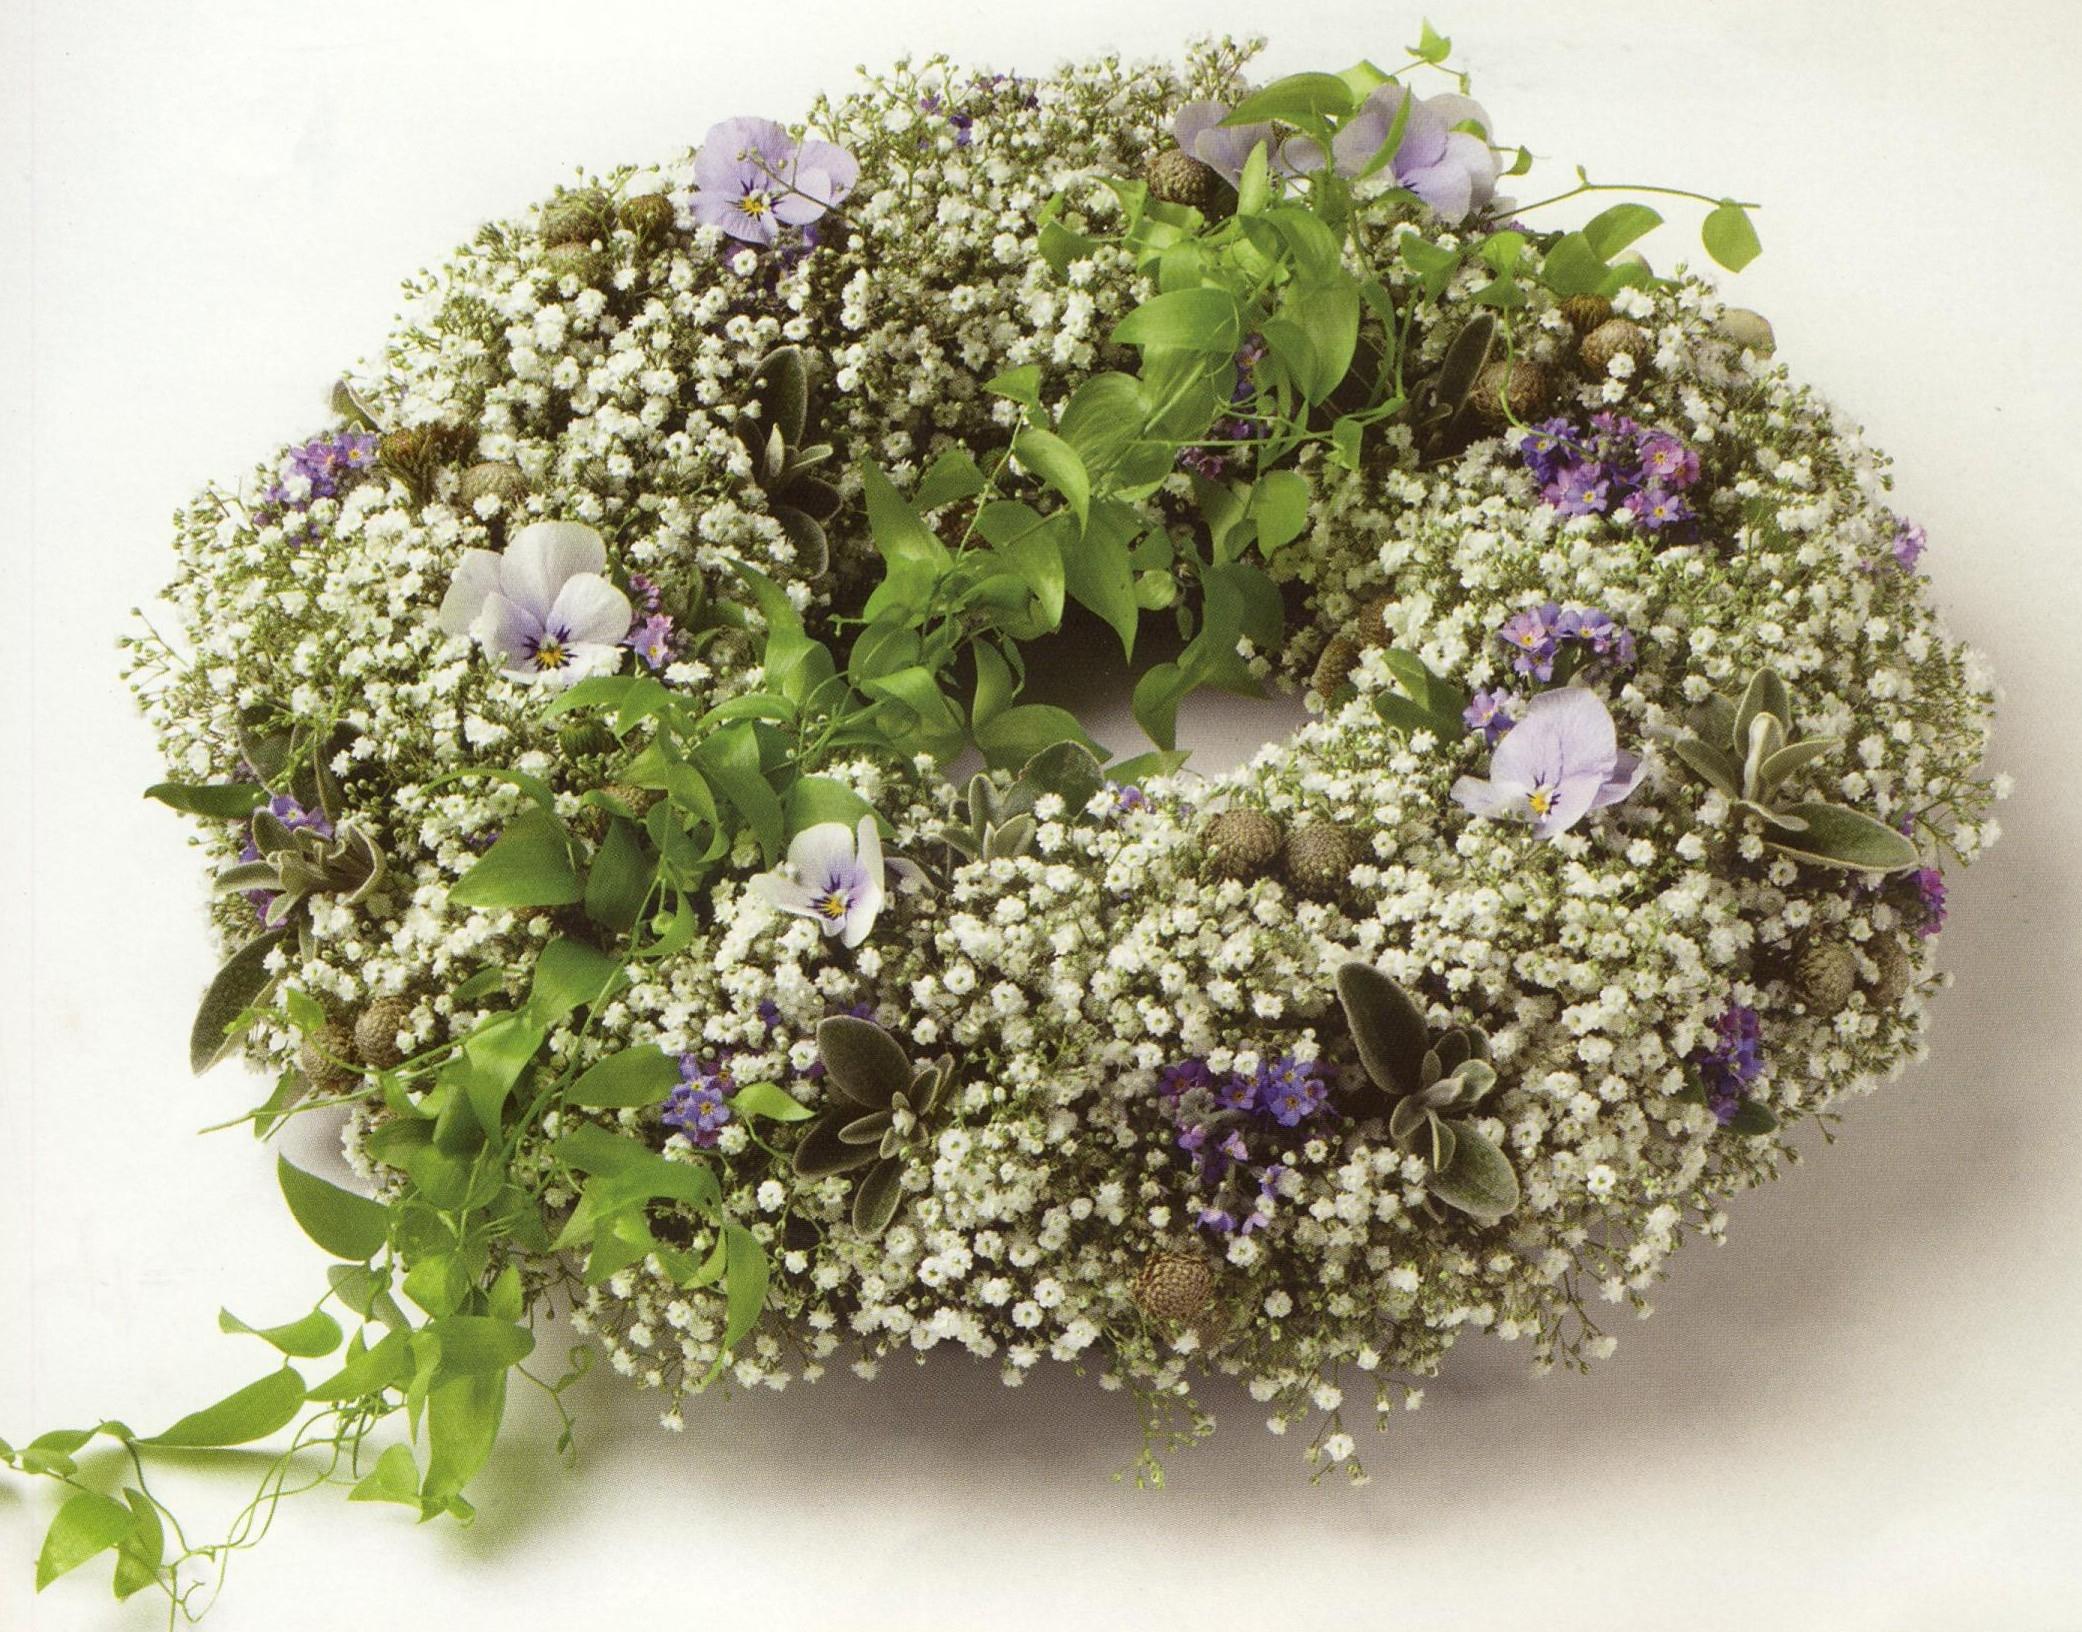 Funeral wreaths hertfordshire funeral florist gypsophila and violets funeral wreath 14 izmirmasajfo